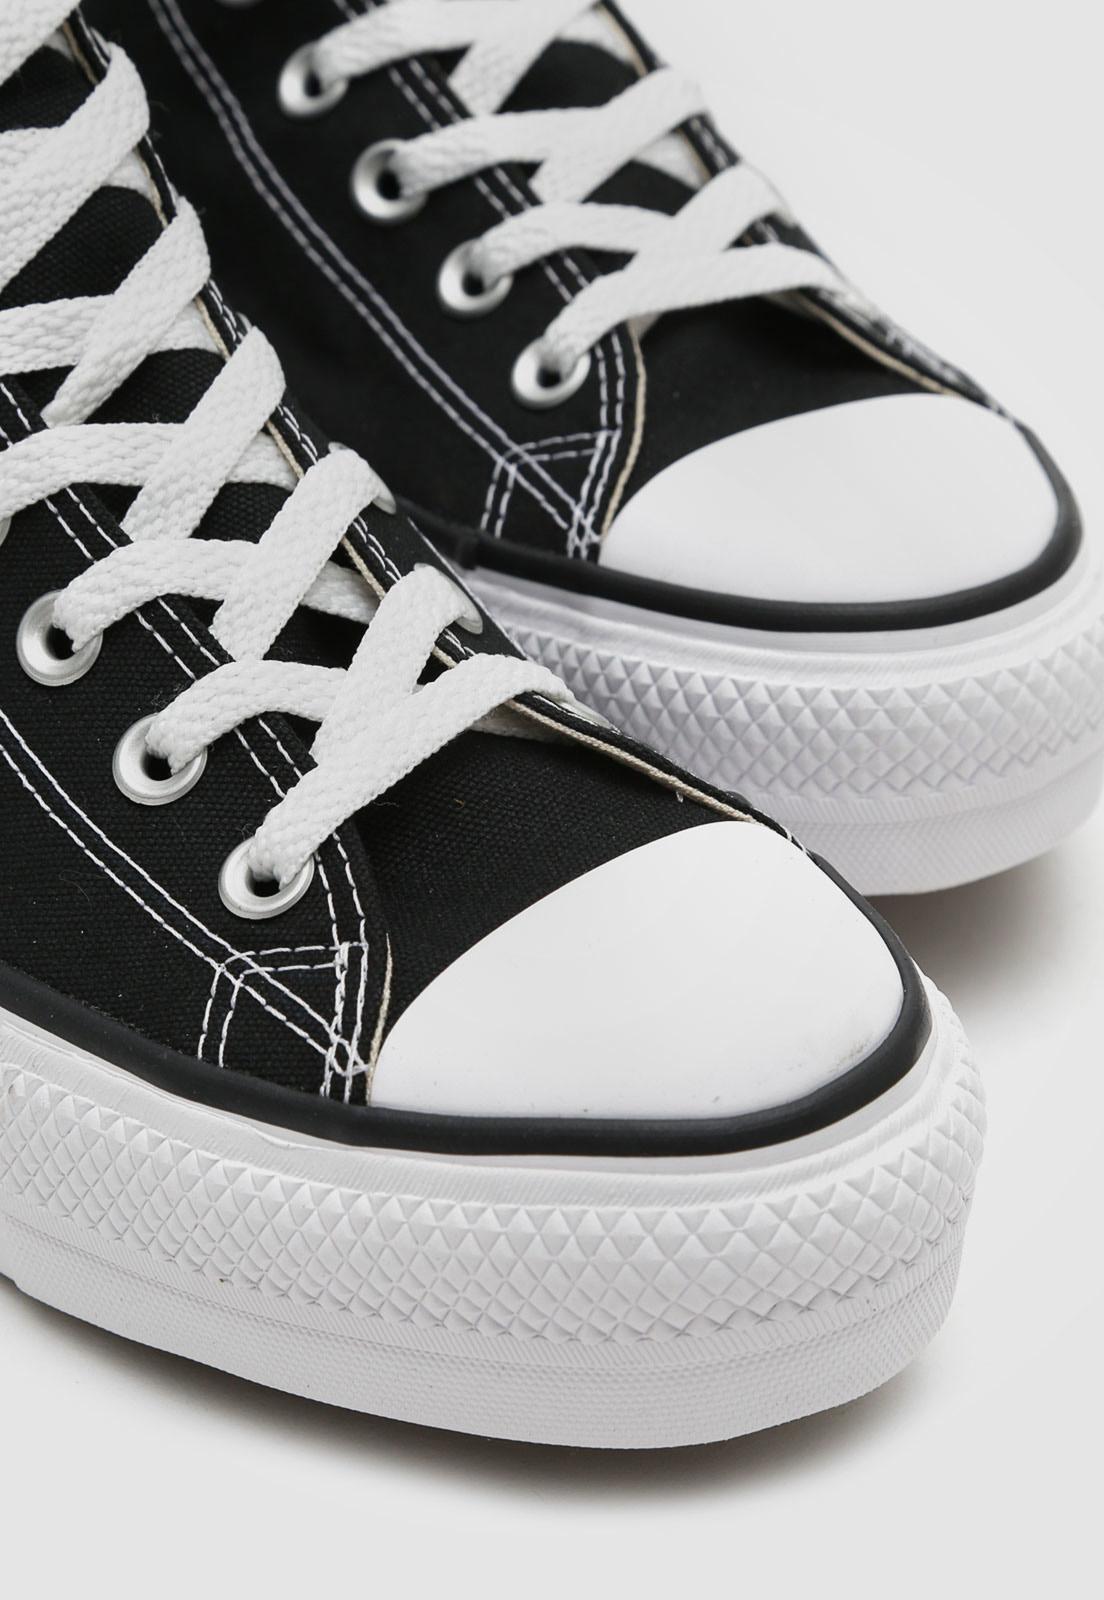 Tênis Converse Chuck Taylor All Star Platform Ox - Preto CT04940001